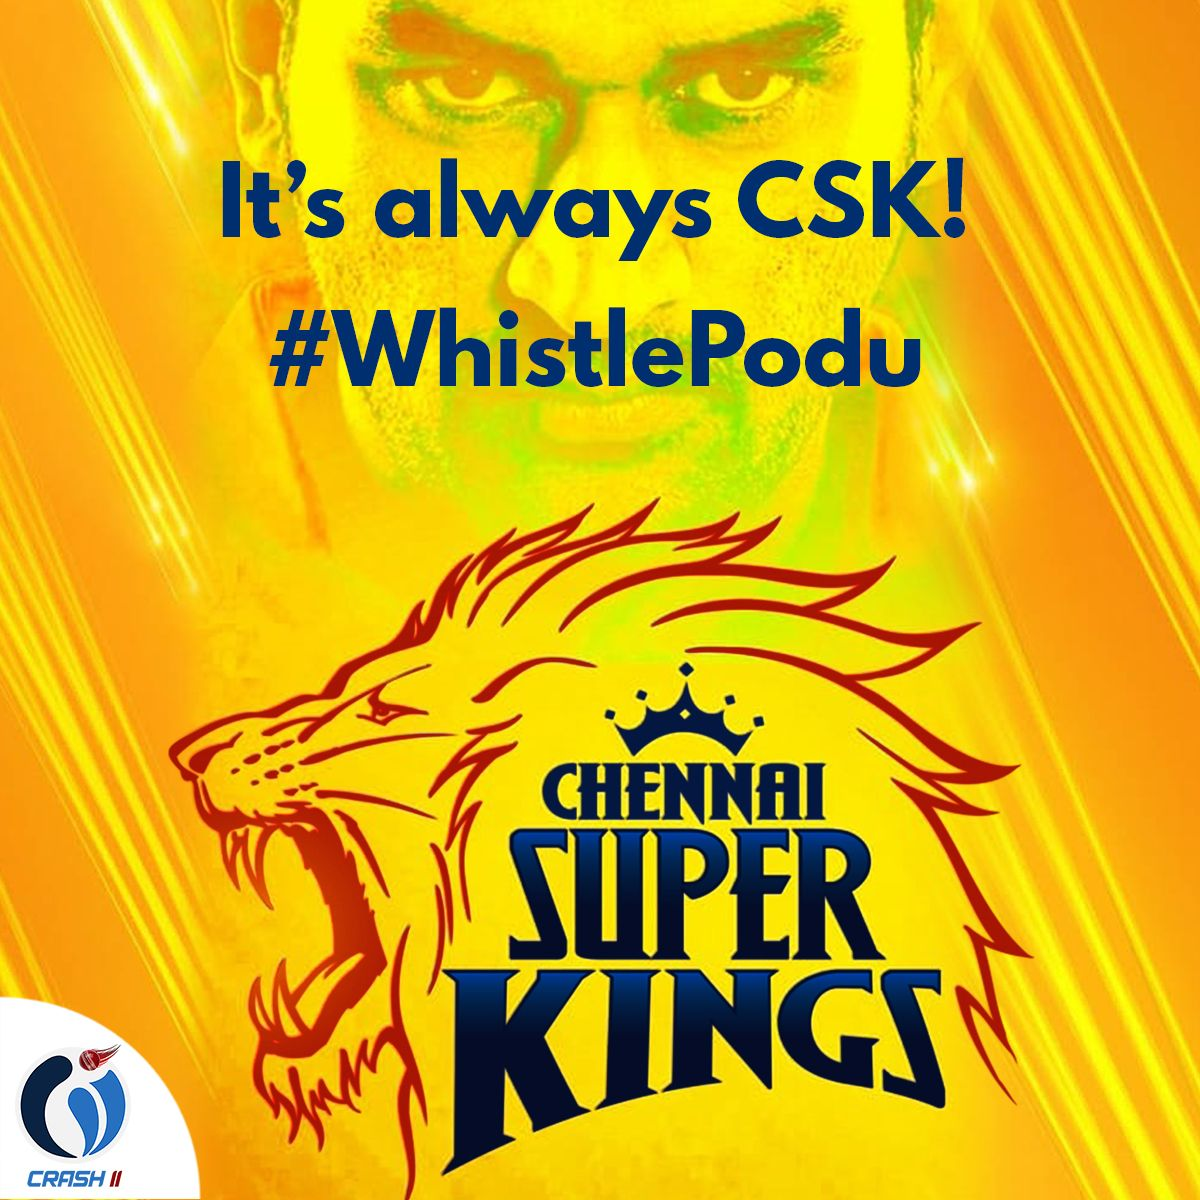 Pin by Apeksha Datt on MSD Chennai super kings, Dhoni